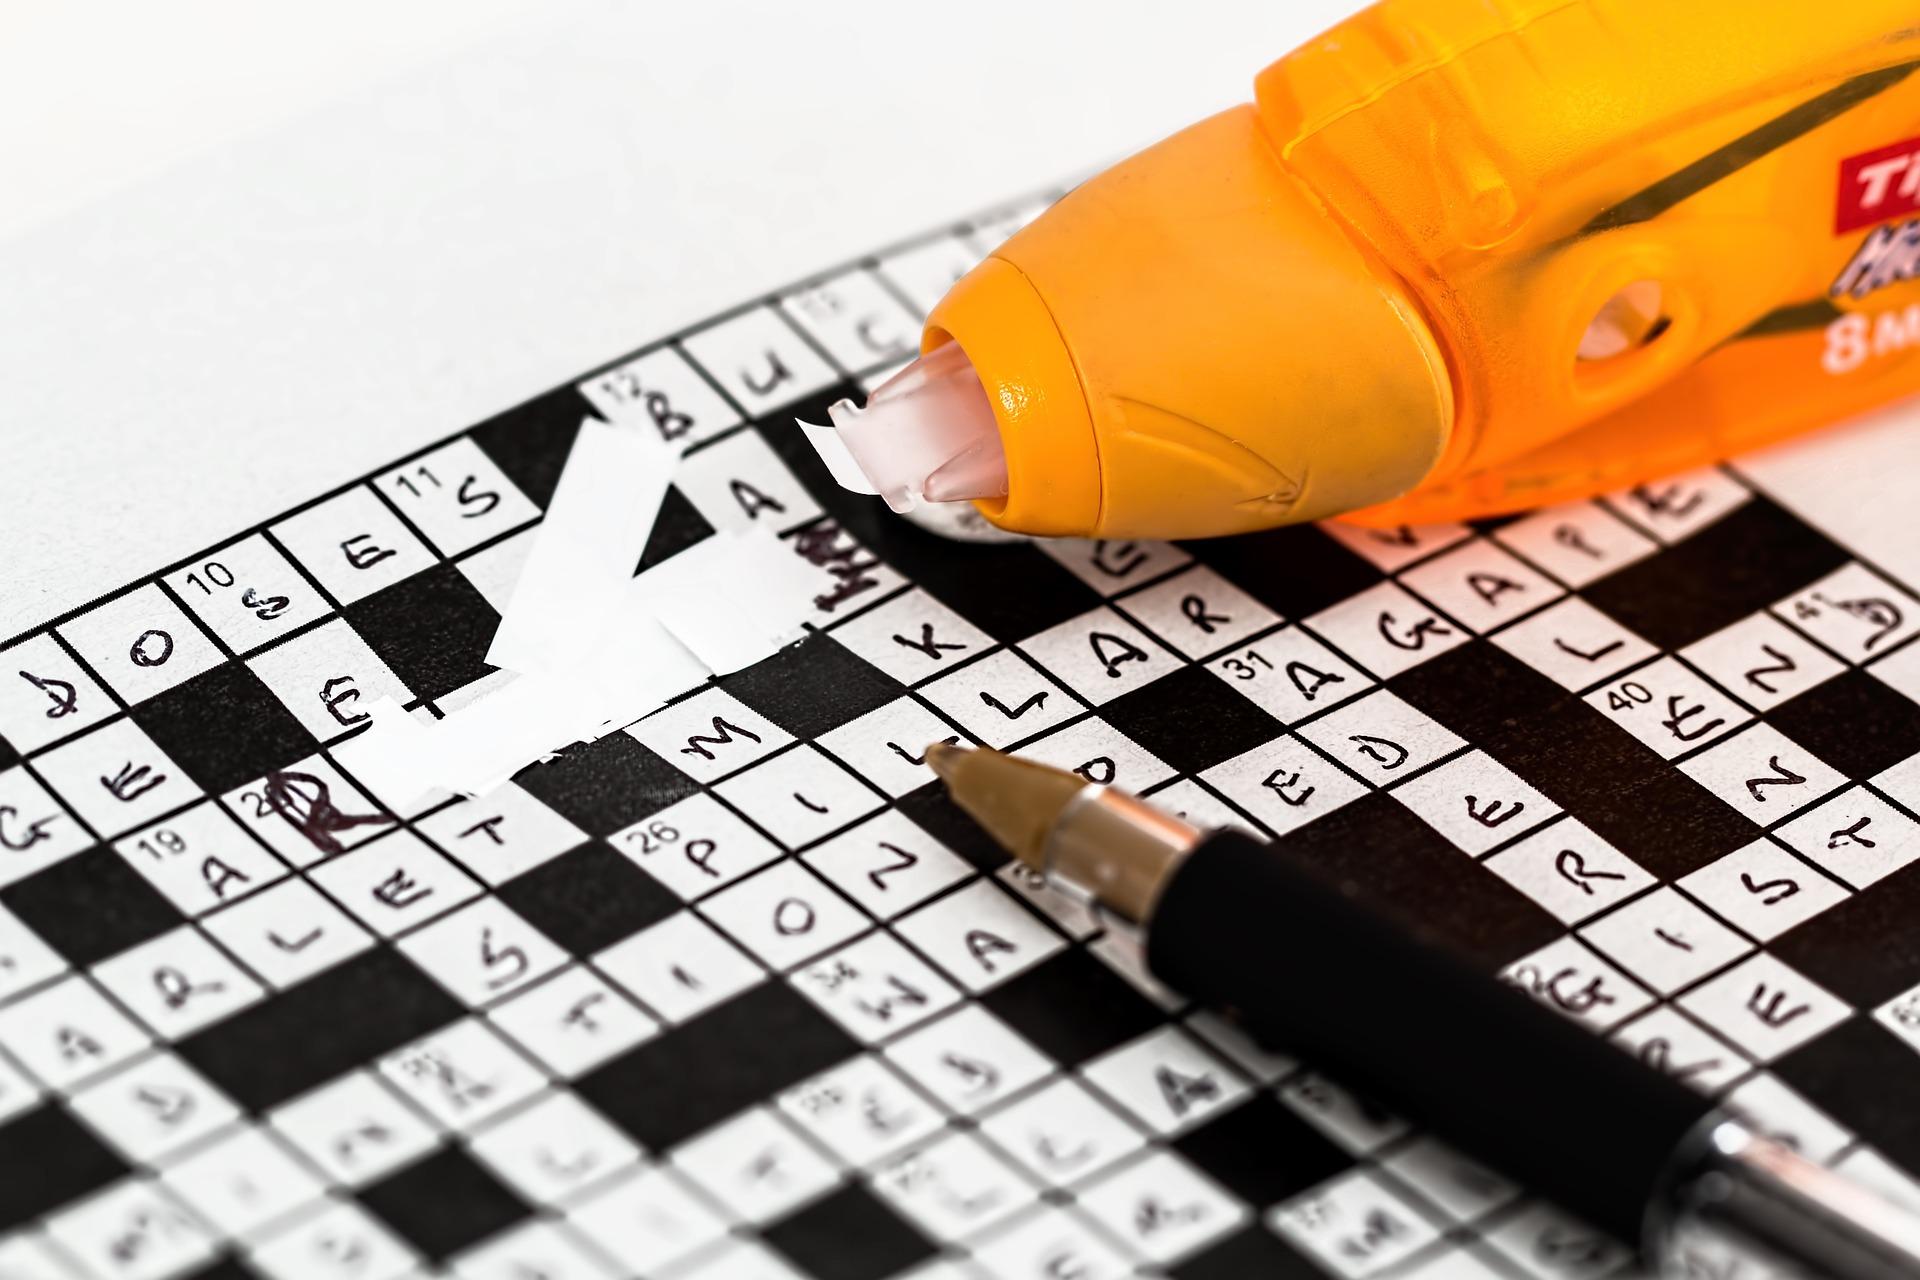 tipexed crossword